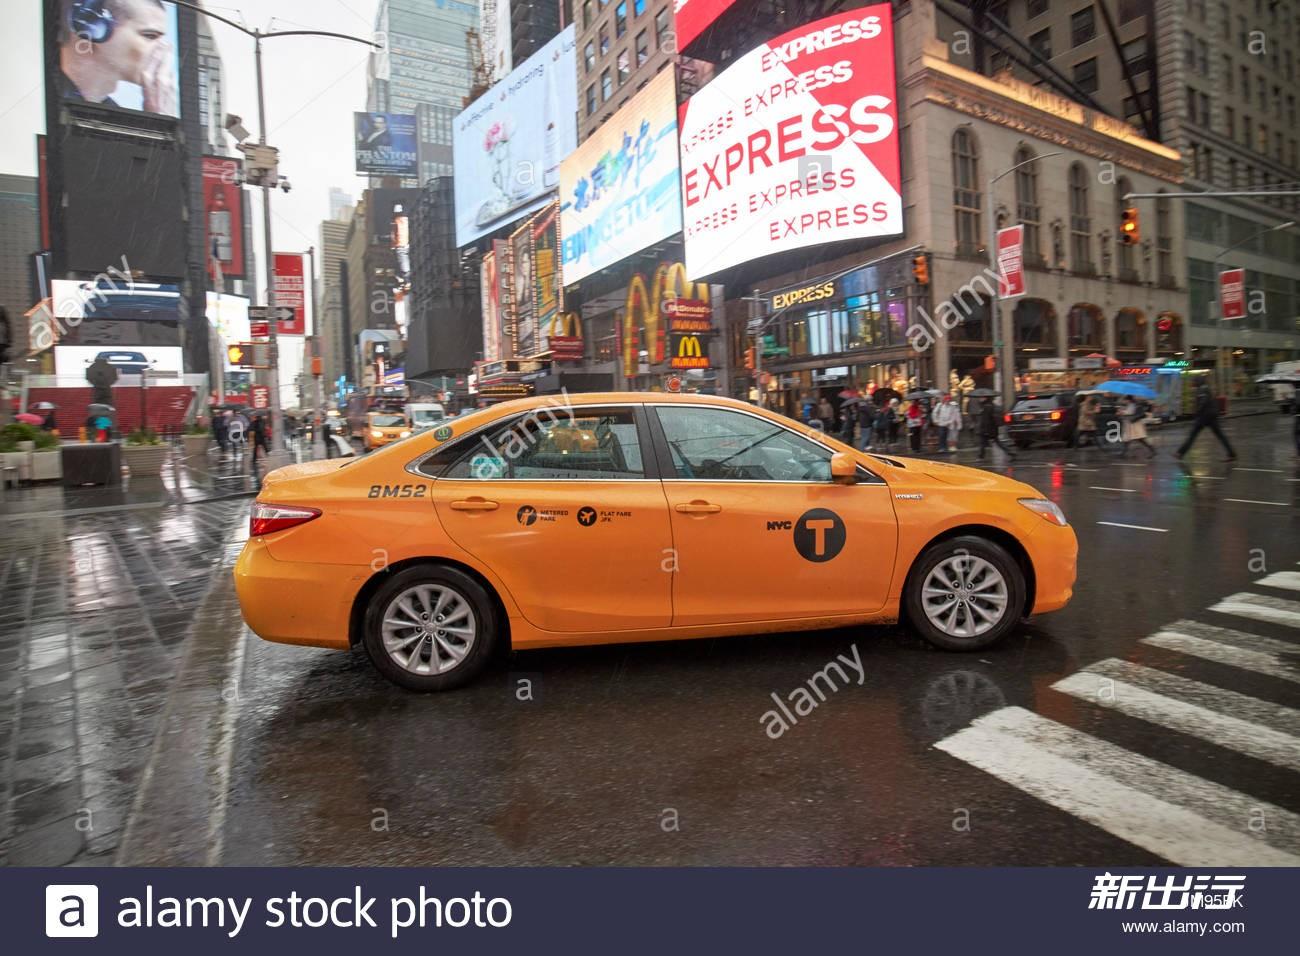 toyota-camry-hybrid-new-york-yellow-taxi-cab-crossing-times-square-JM95FK.jpg